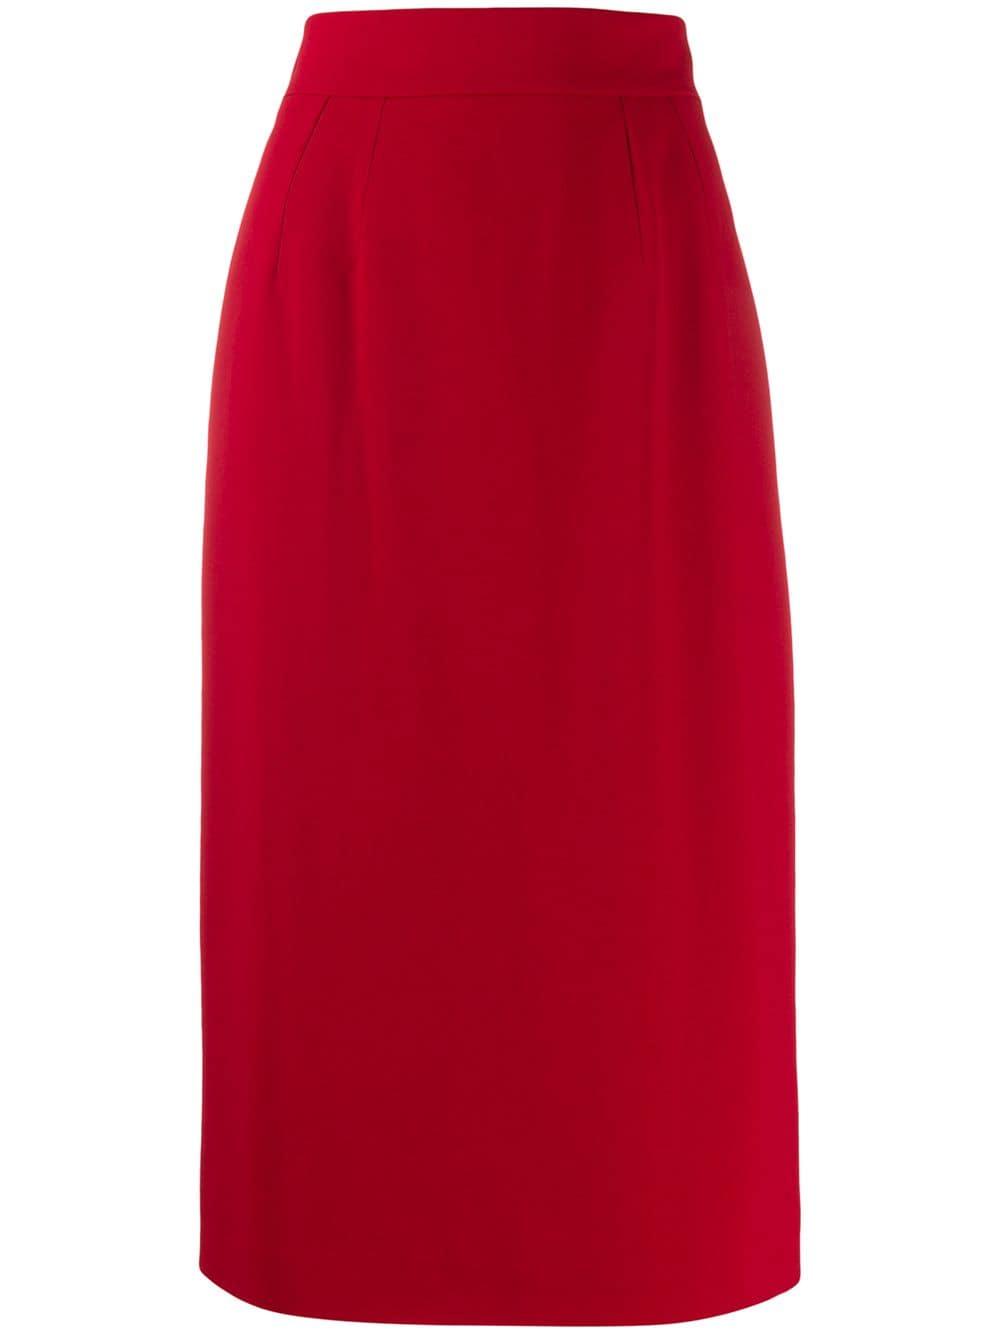 Dolce & Gabbana юбка-карандаш с завышенной талией